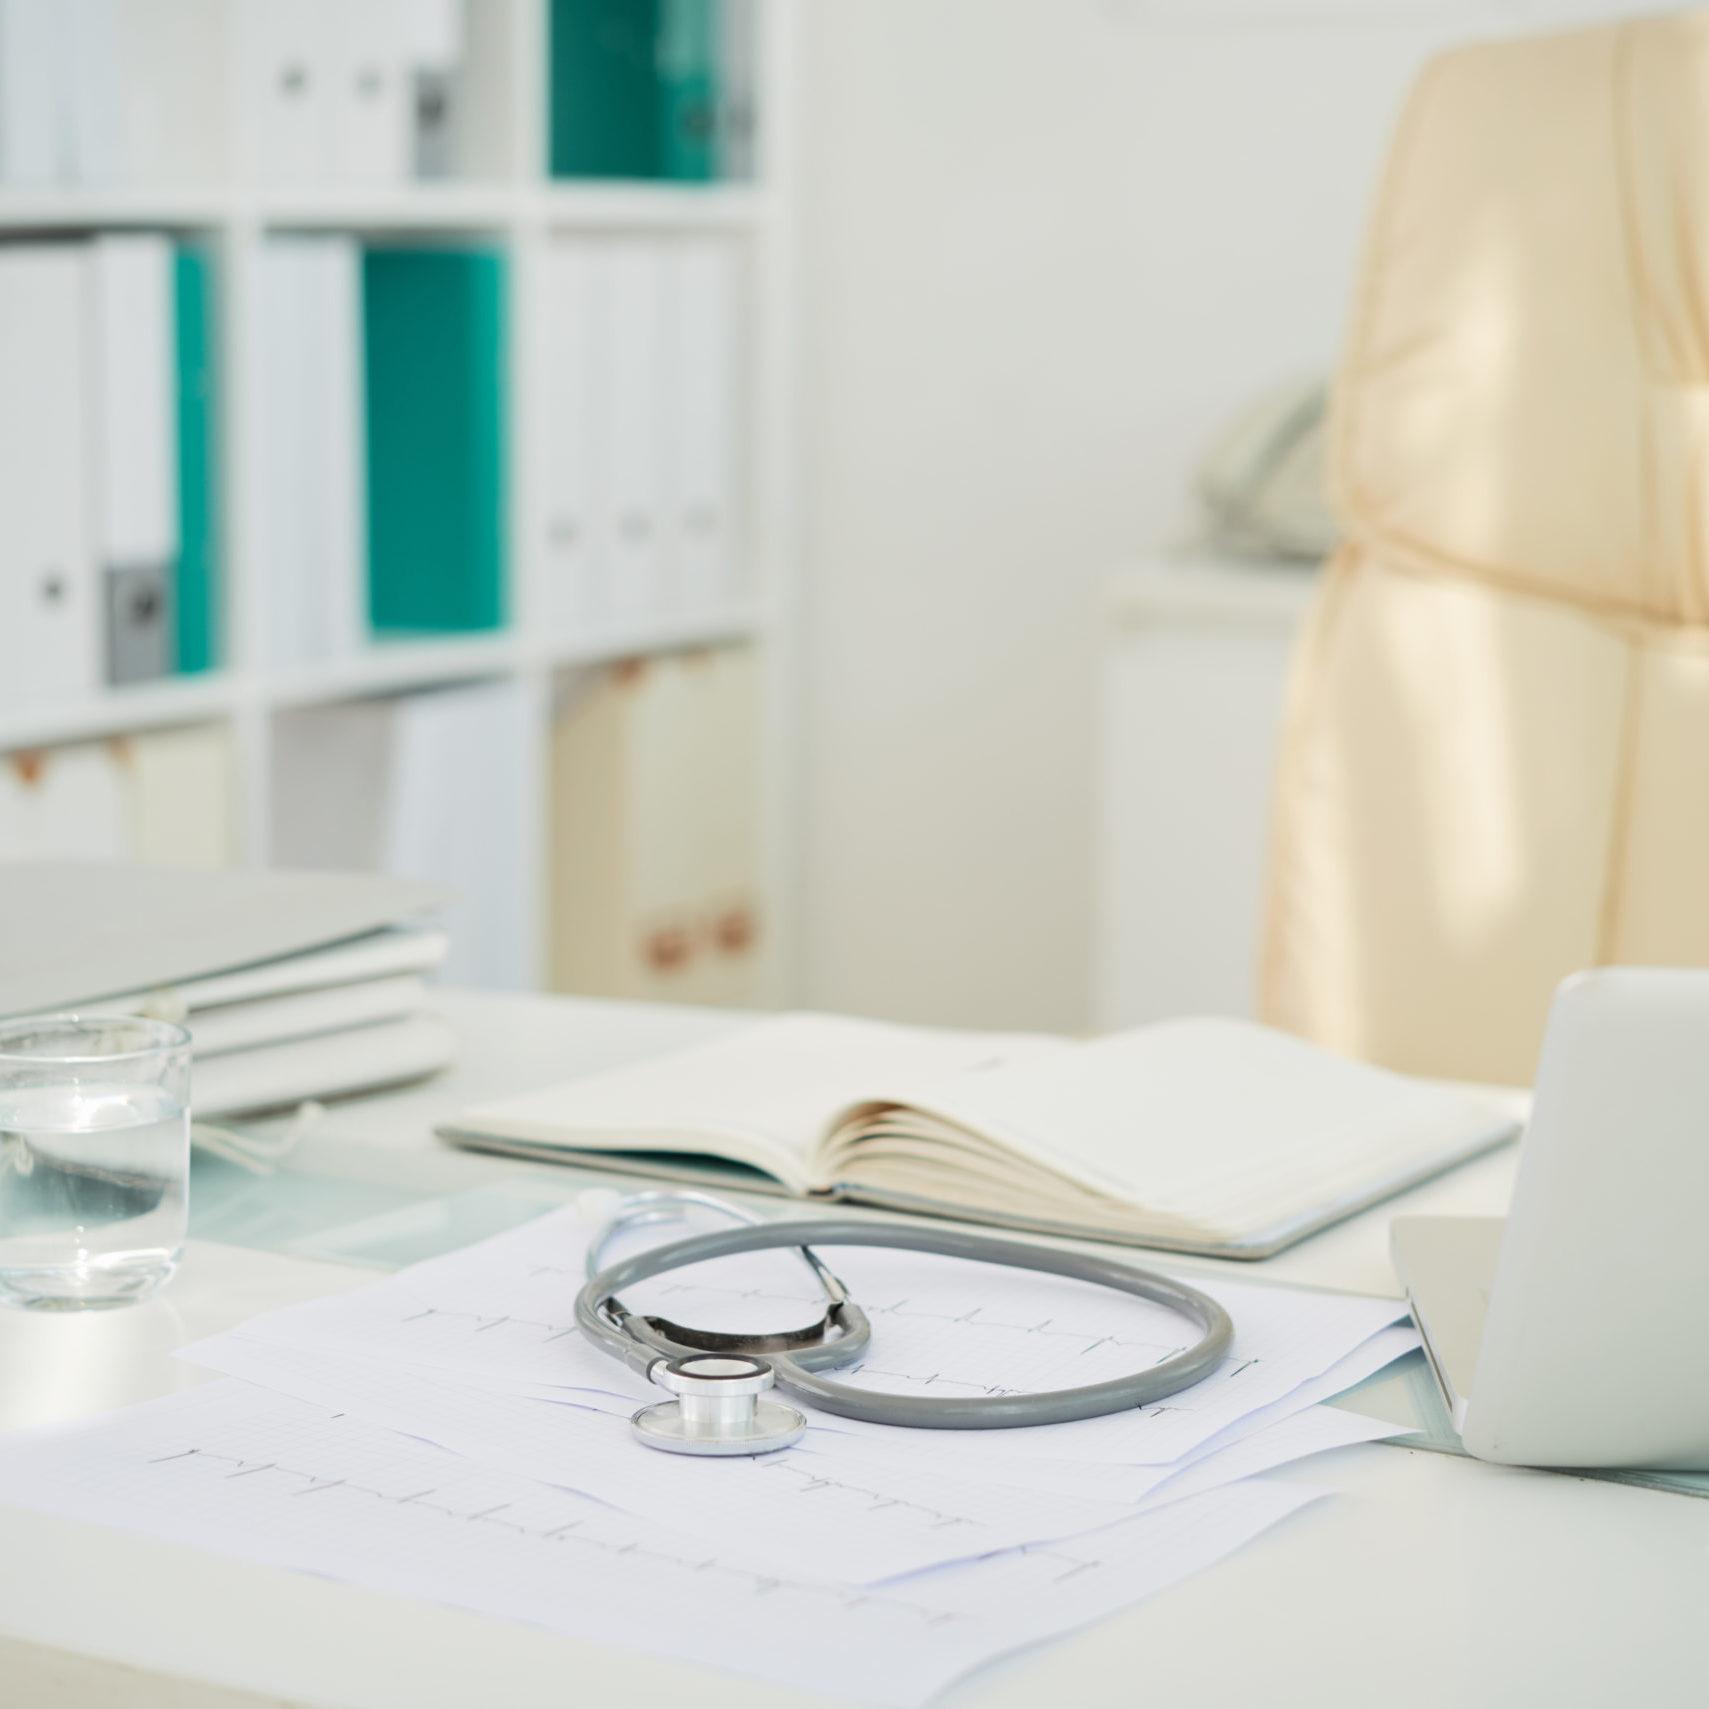 worplace-in-modern-hospital